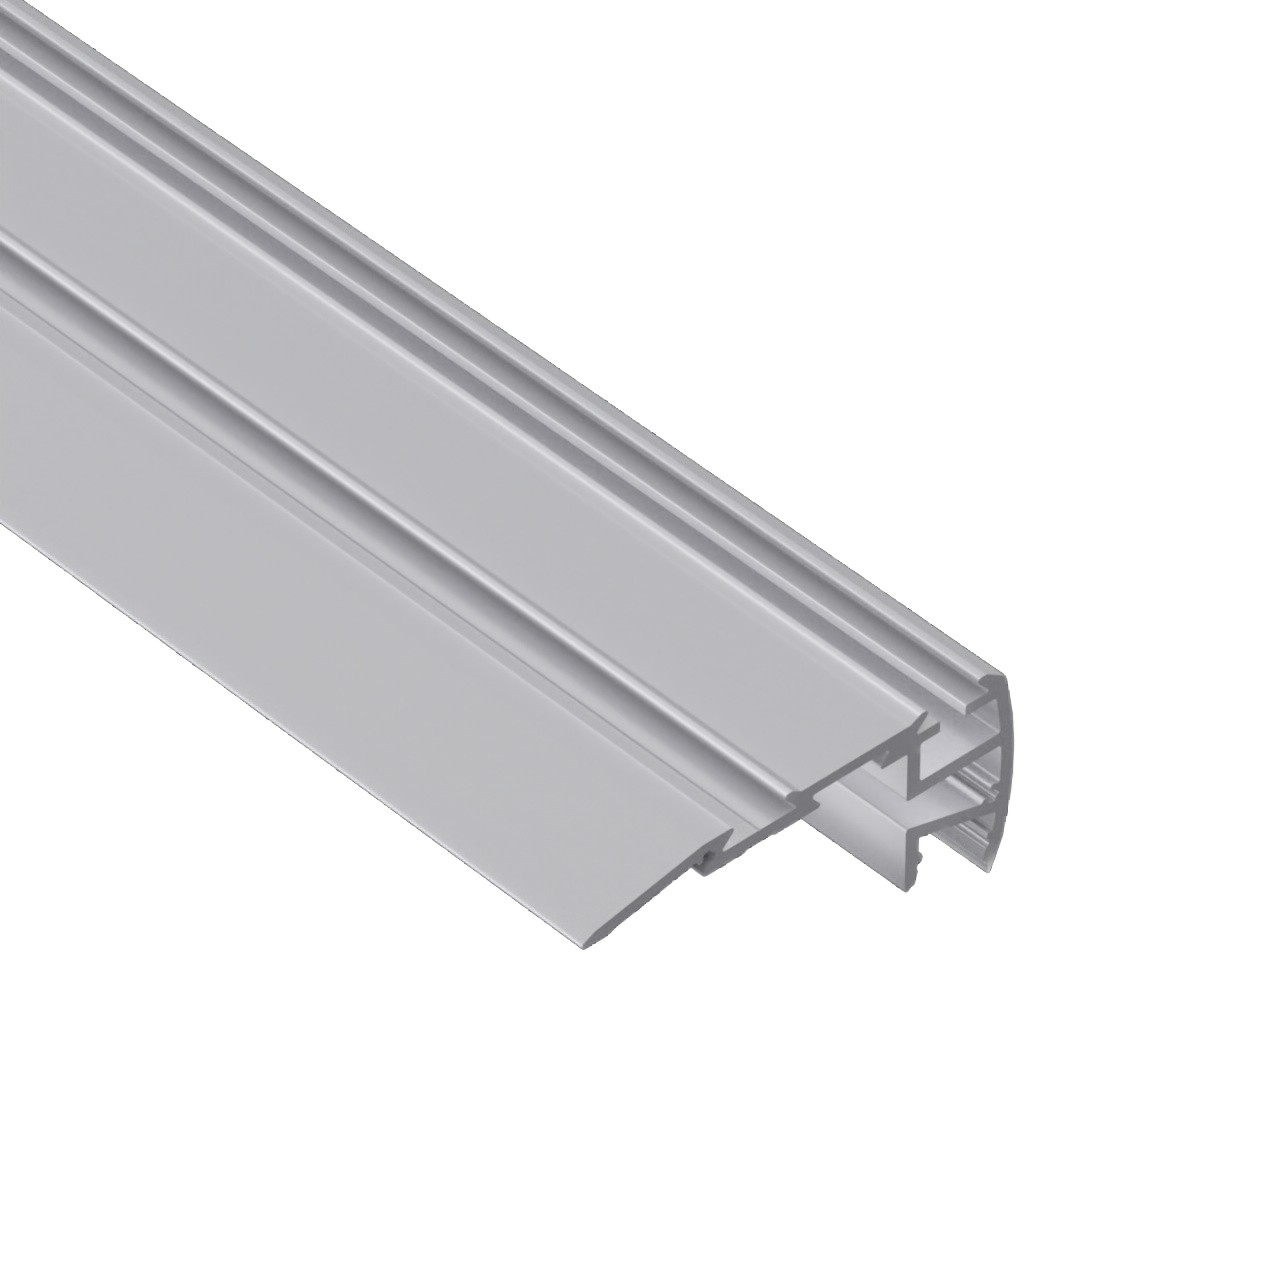 ST3 Stair Næse Led Aluminium Profile